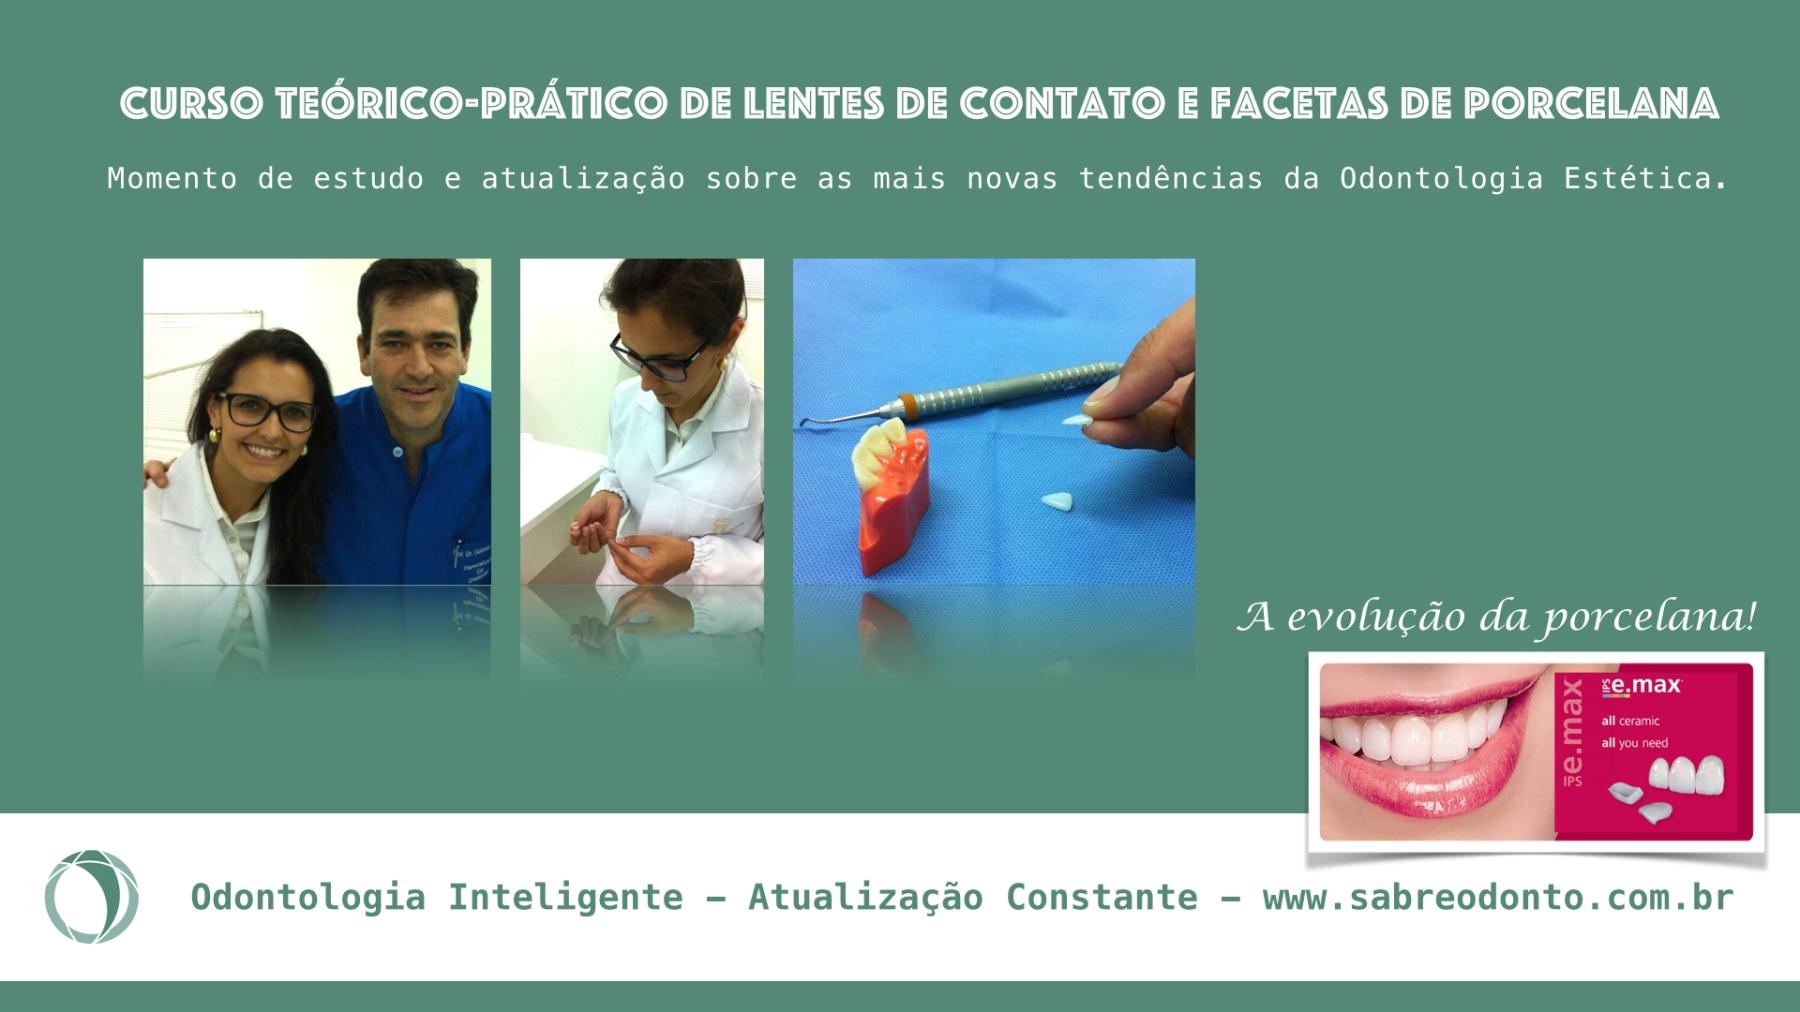 curso facetas de porcelana. odontologia estética, lentes de contato, sabreodonto, sabre odontologia inteligente